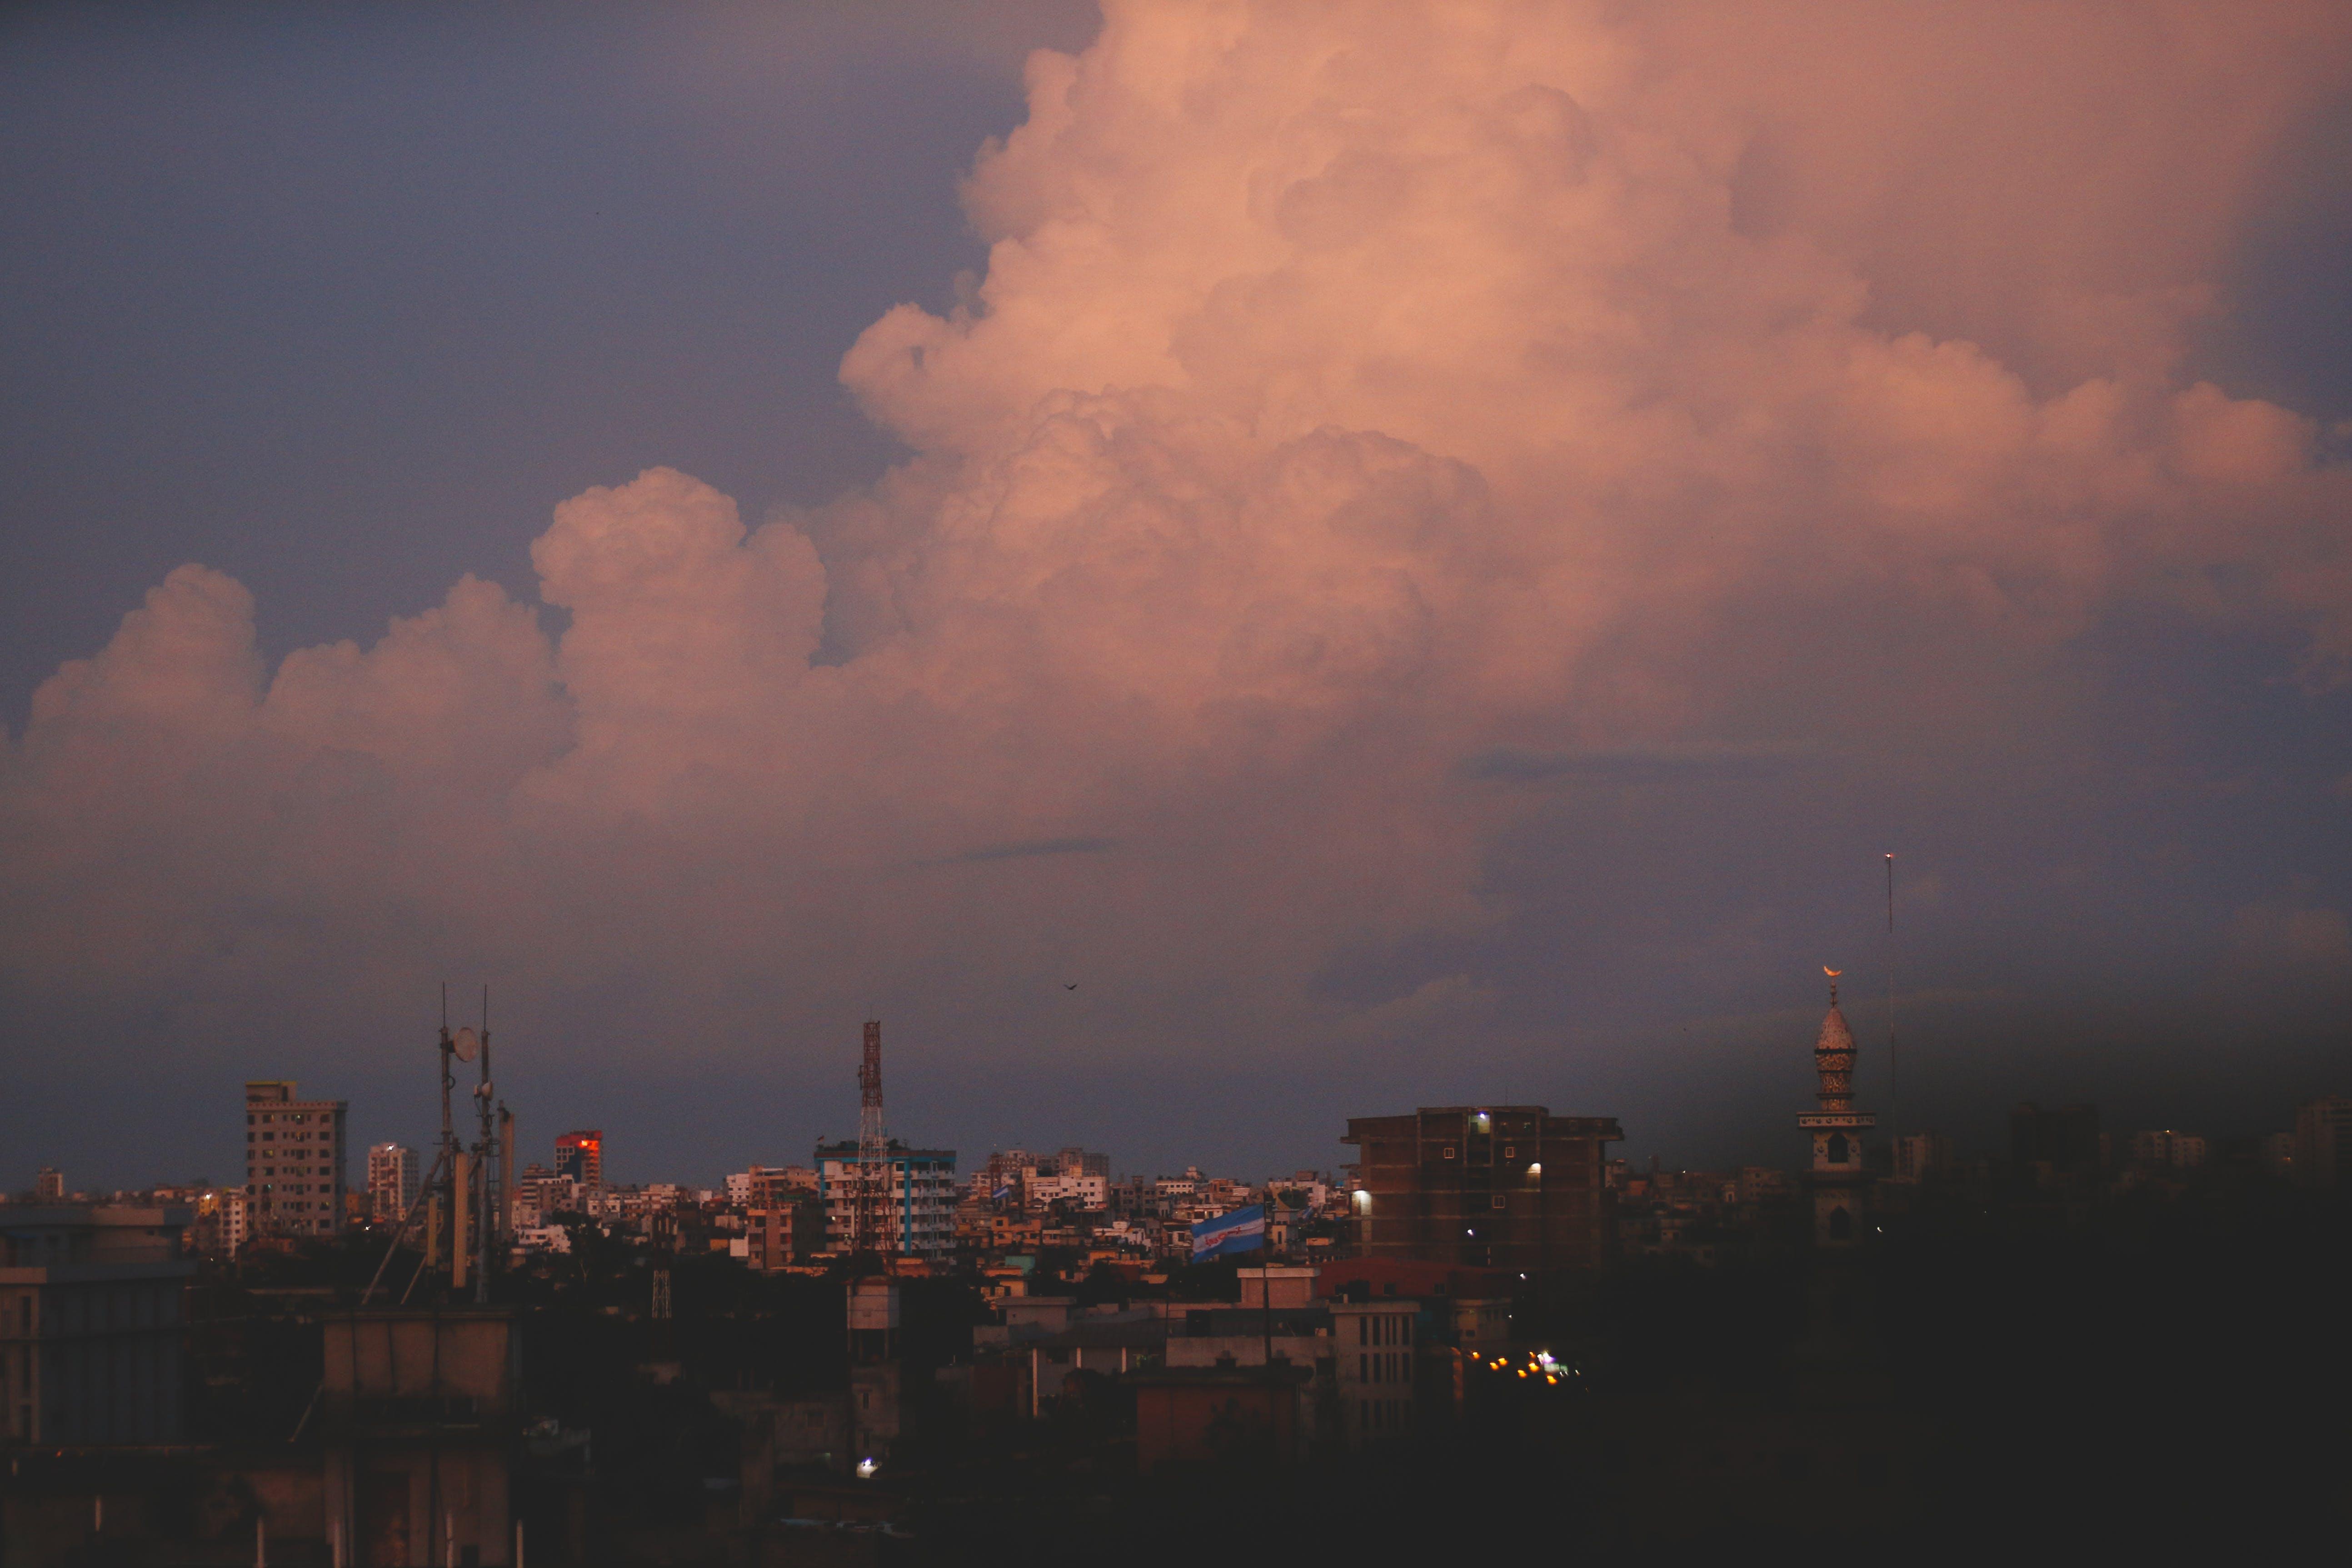 City Photography during Nightfall